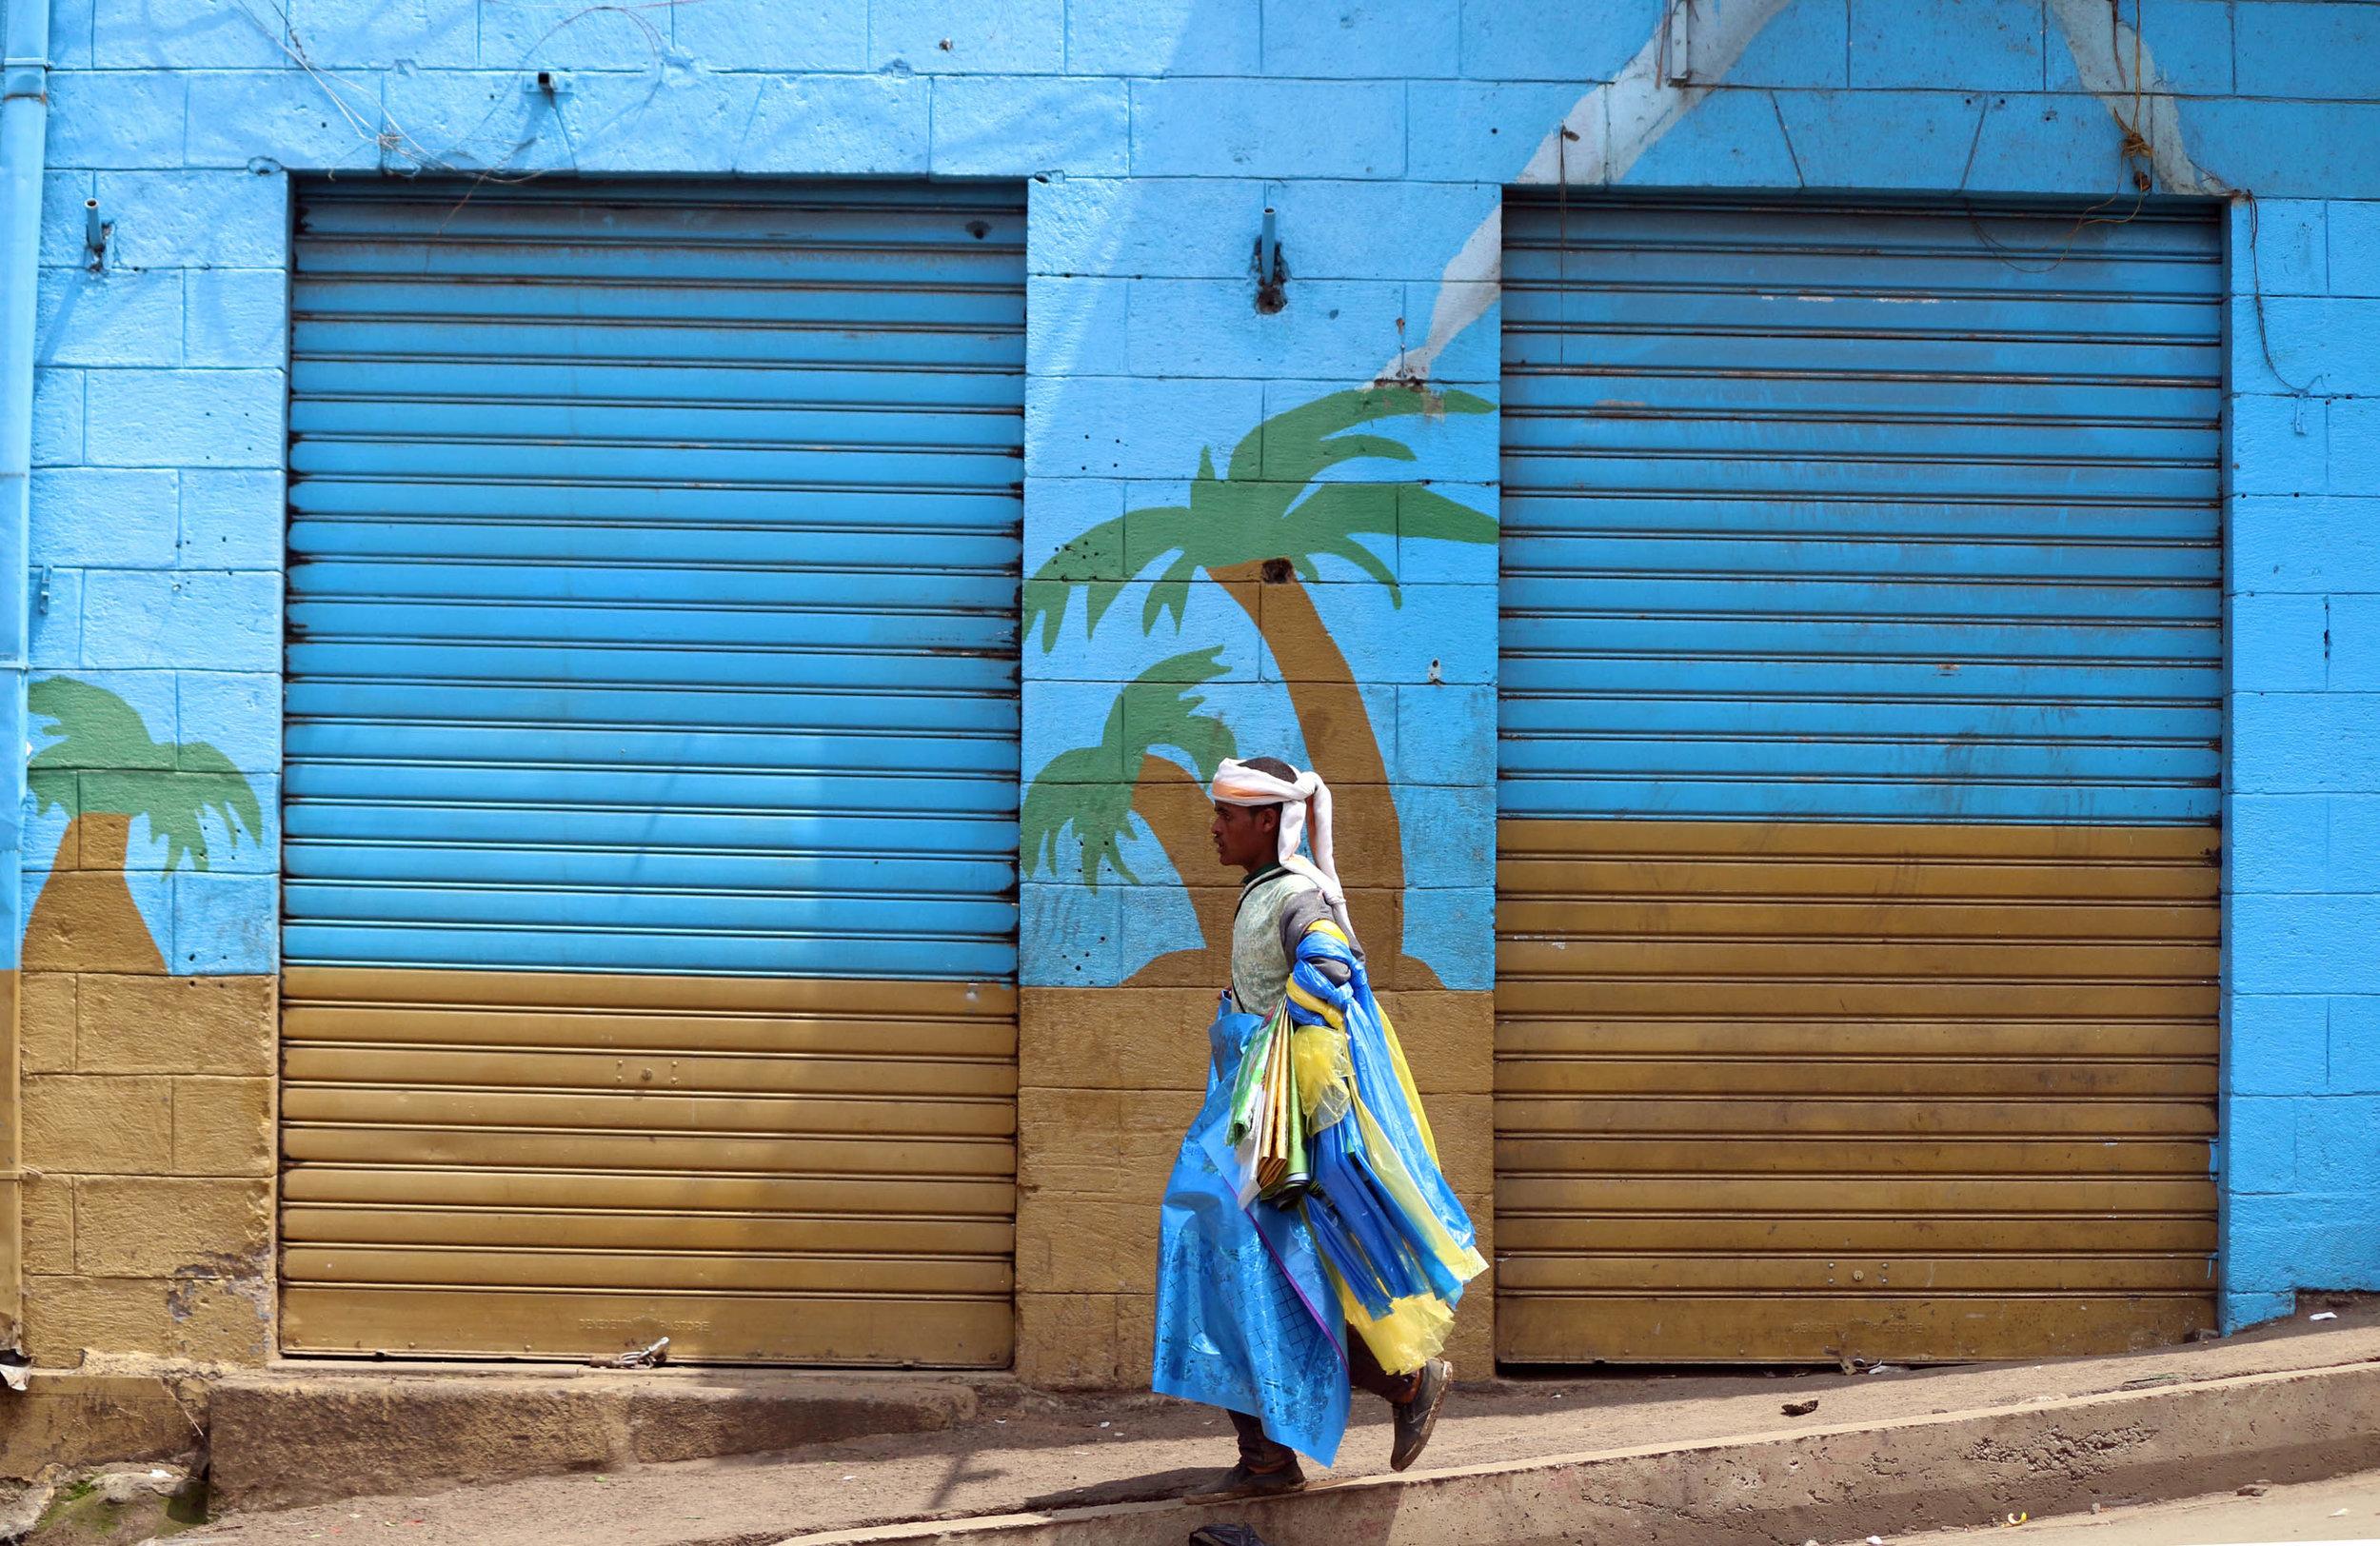 Images by Samson Sileshi